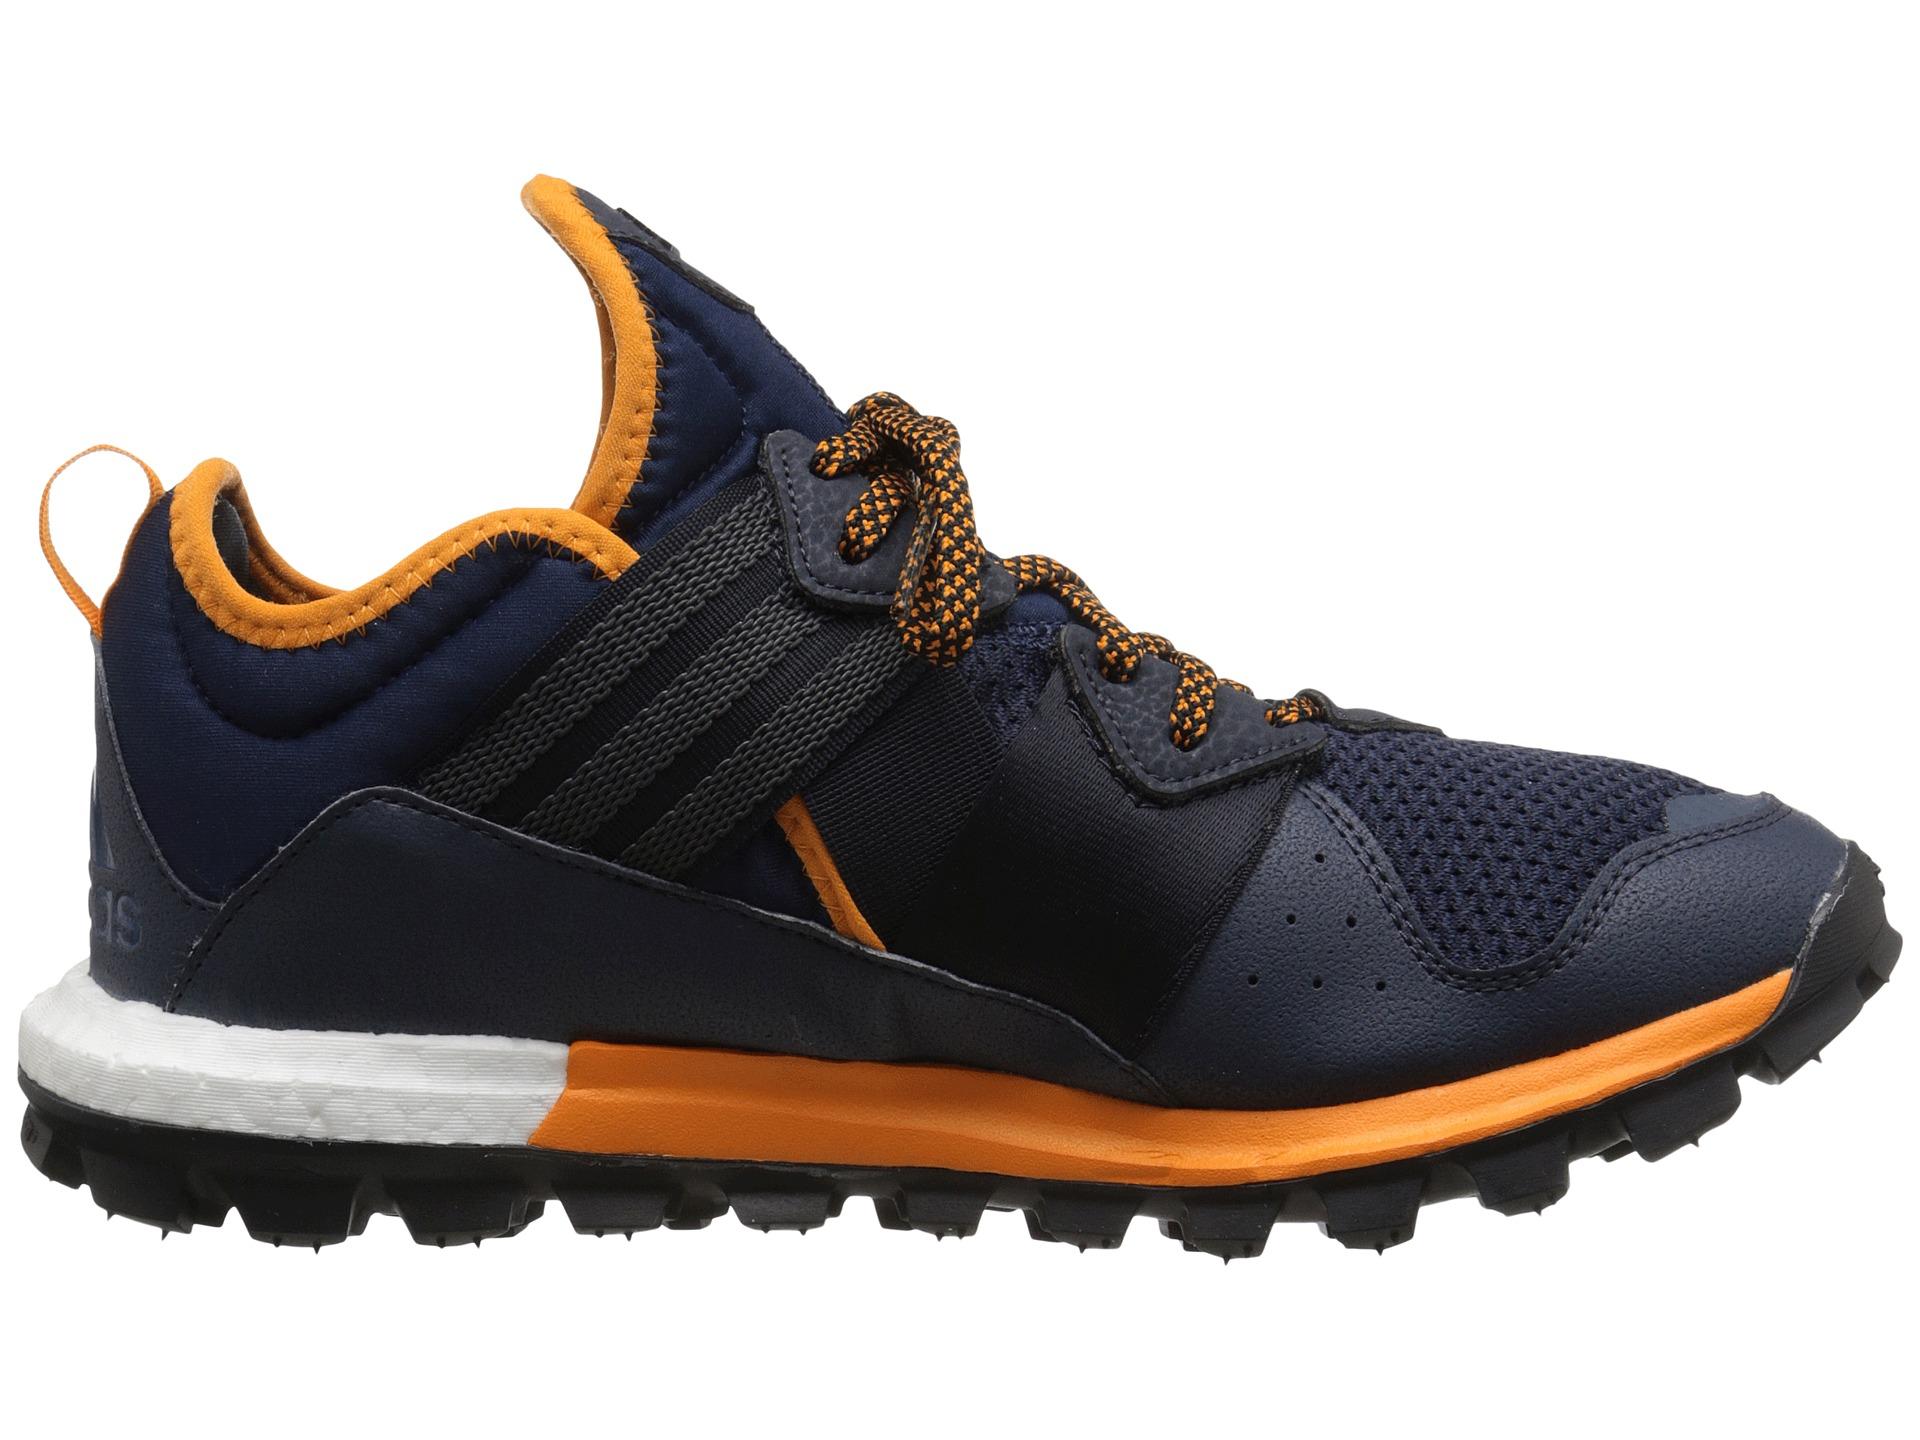 1422209e0 Adidas Running Response Trail Boost Collegiate Navy Mineral Blue Eqt  Orange